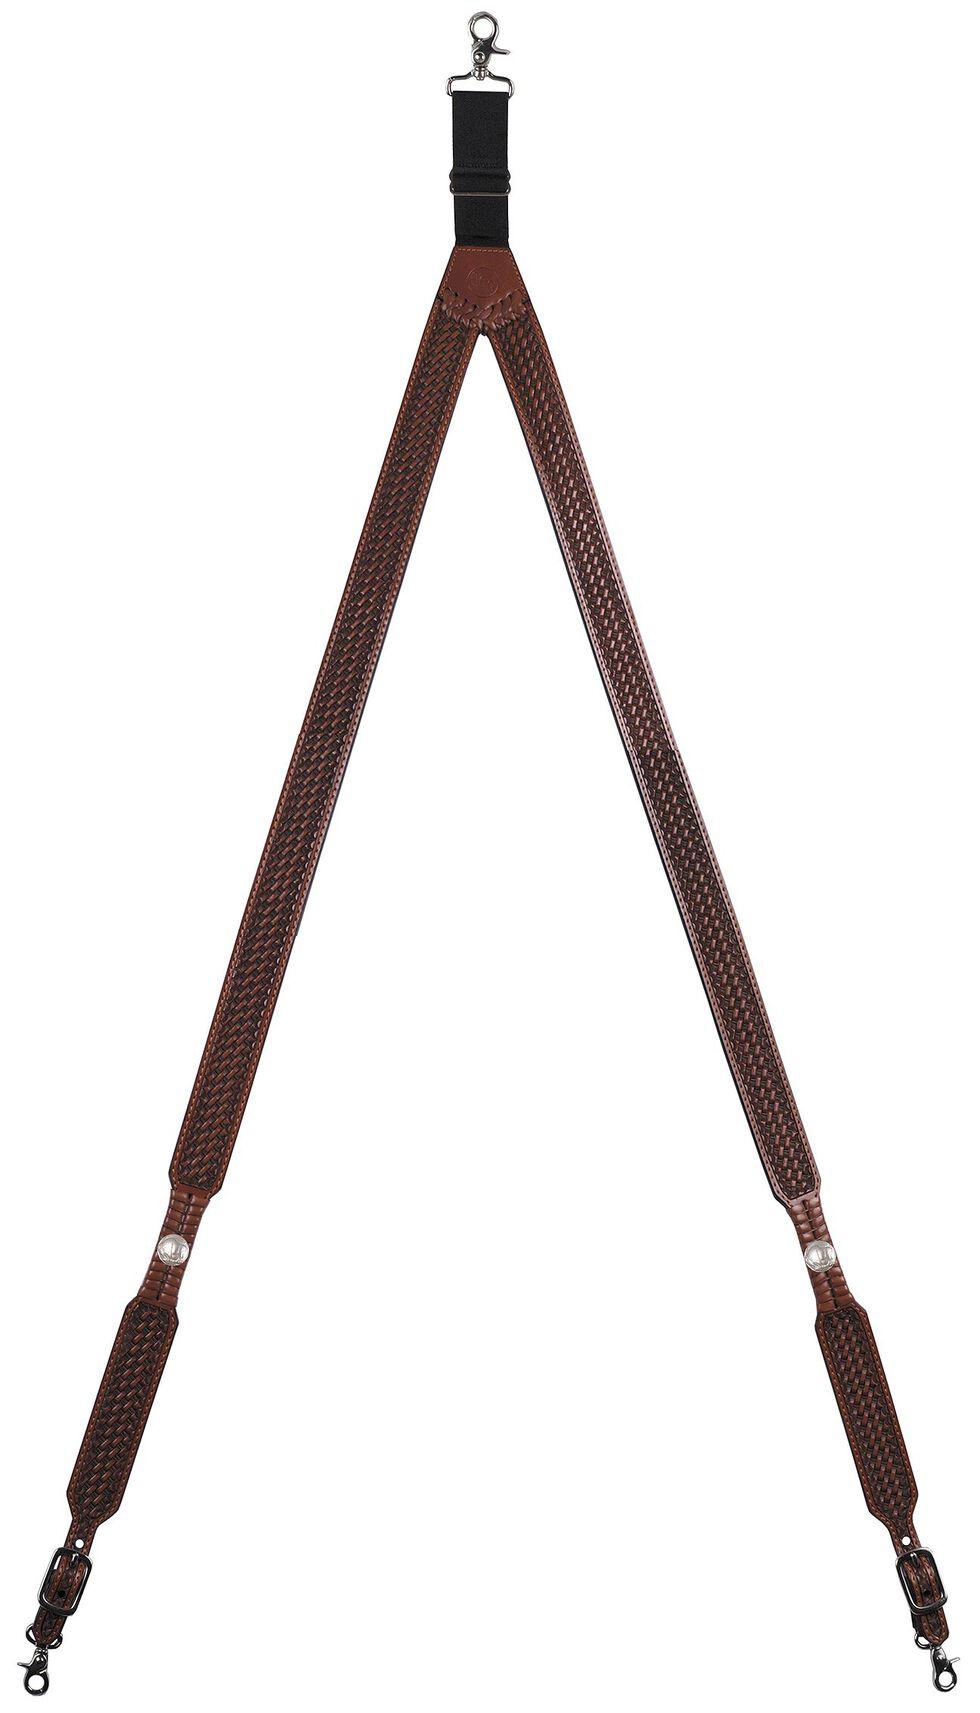 3D Basketweave Buffalo Concho Suspenders - XL, Tan, hi-res